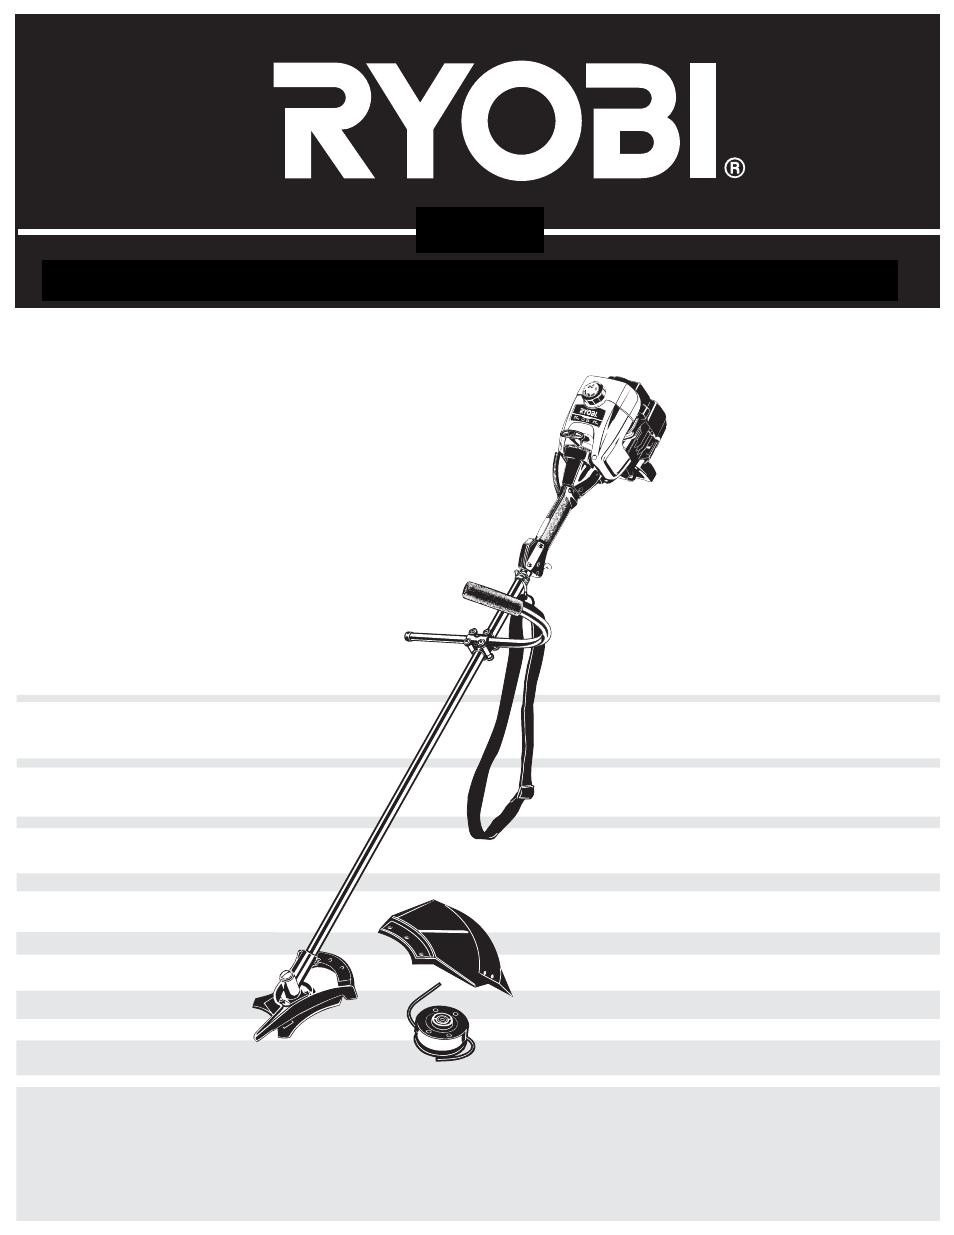 ryobi 790r user manual 76 pages rh manualsdir com ryobi 780r parts diagram ryobi gas trimmer 780r manual